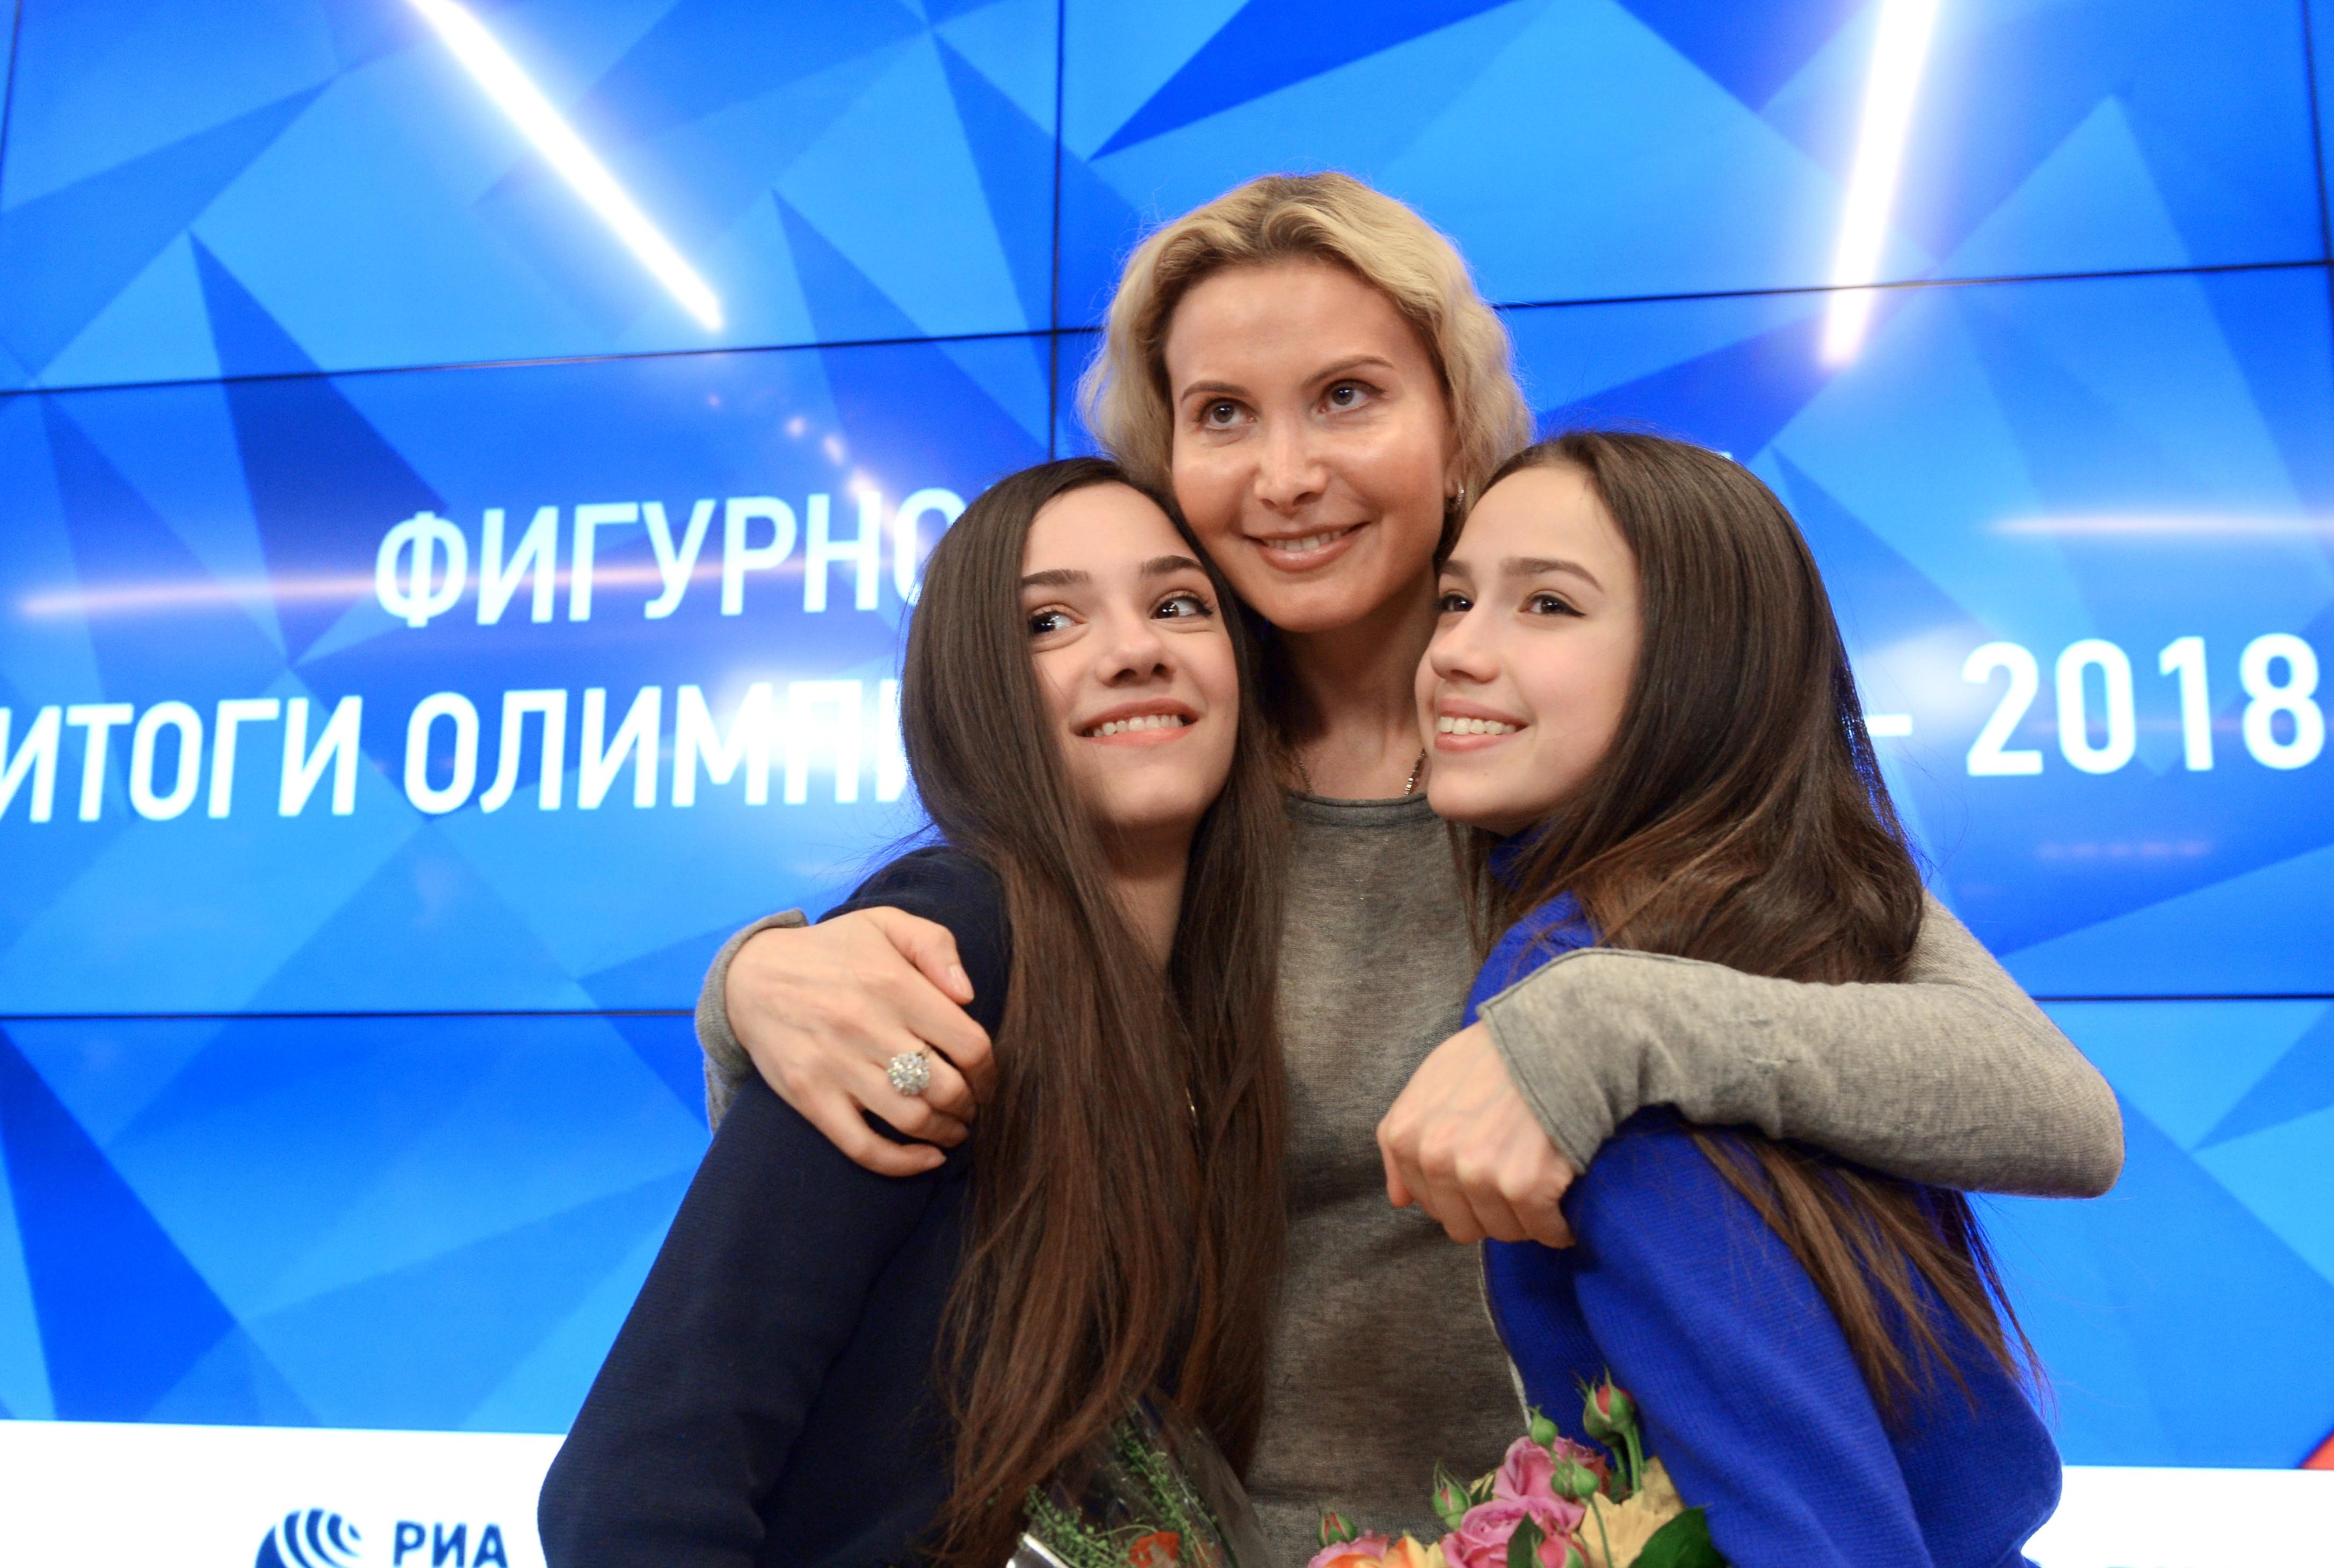 Фото: © РИА Новости/Владимир Трефилов